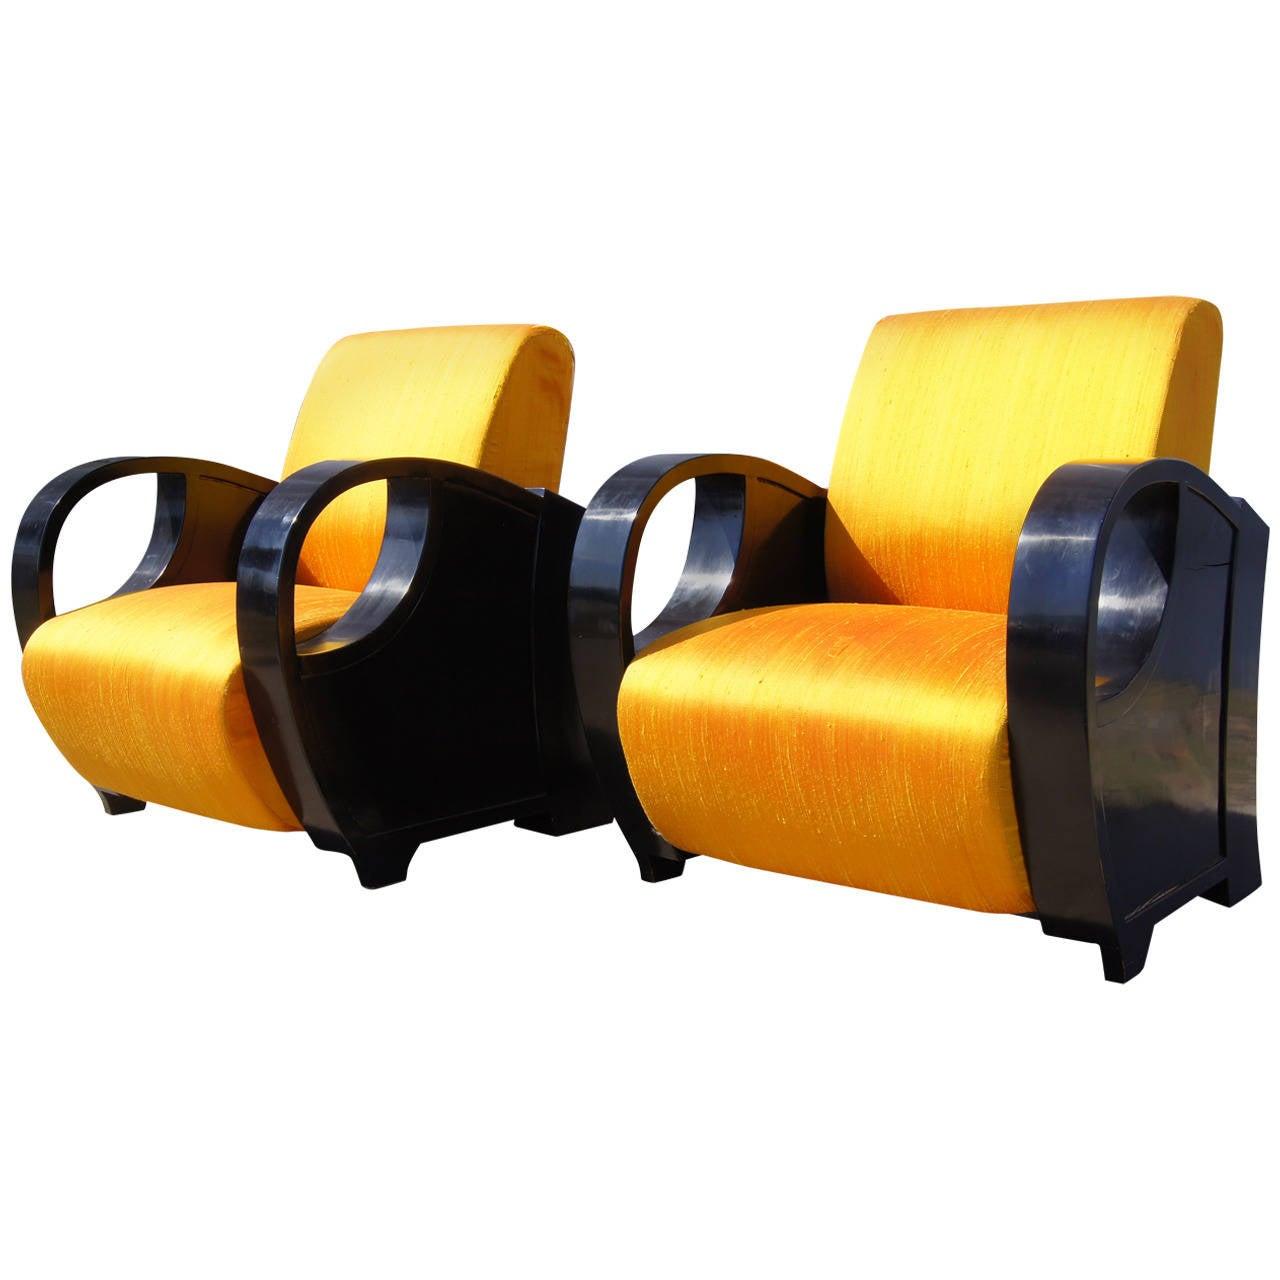 Pair of Ebonized Art Deco Club Chairs 1